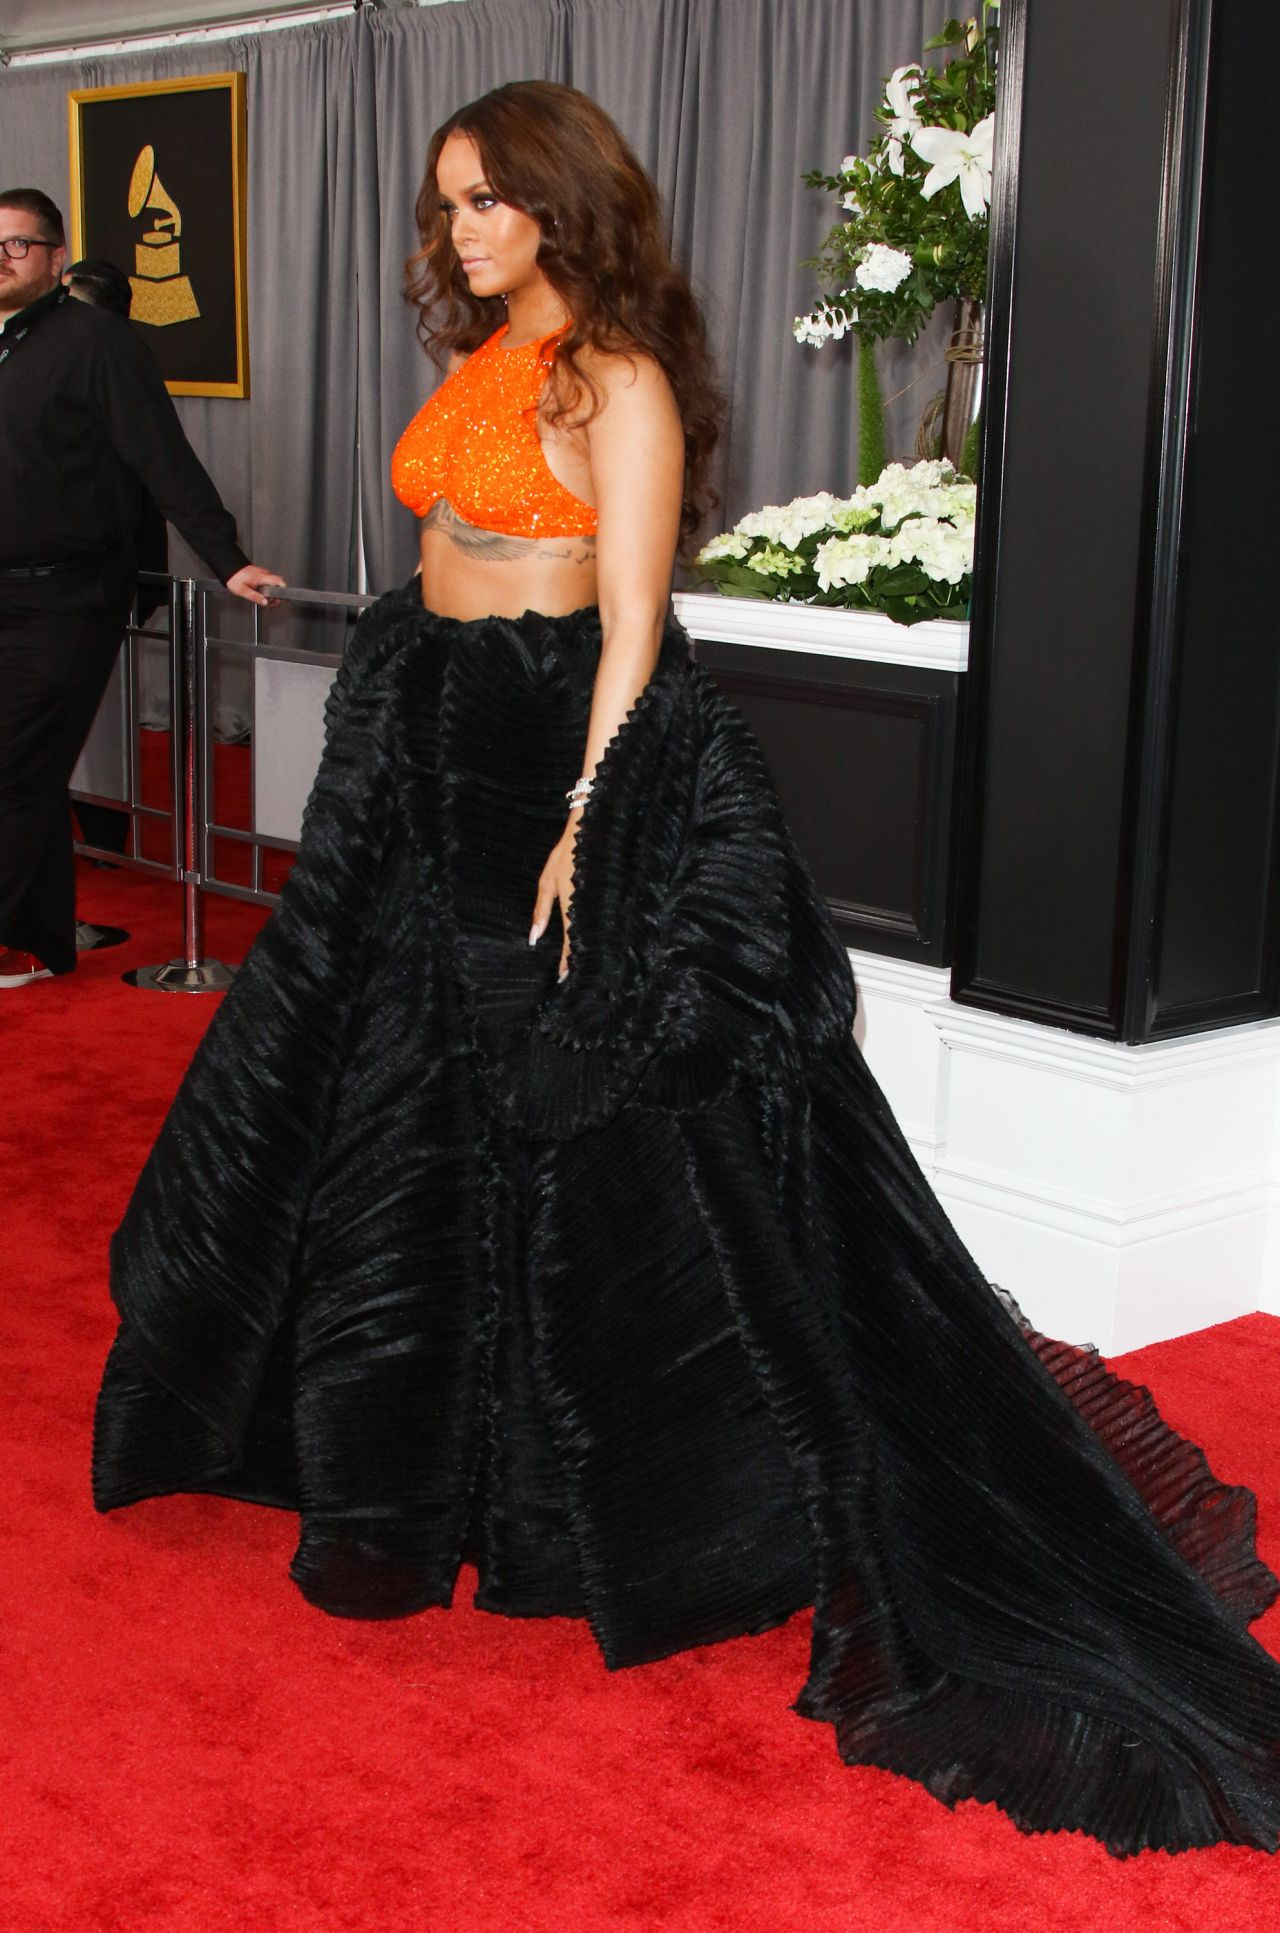 Rihanna On Red Carpet Grammy Awards In Los Angeles 2 12